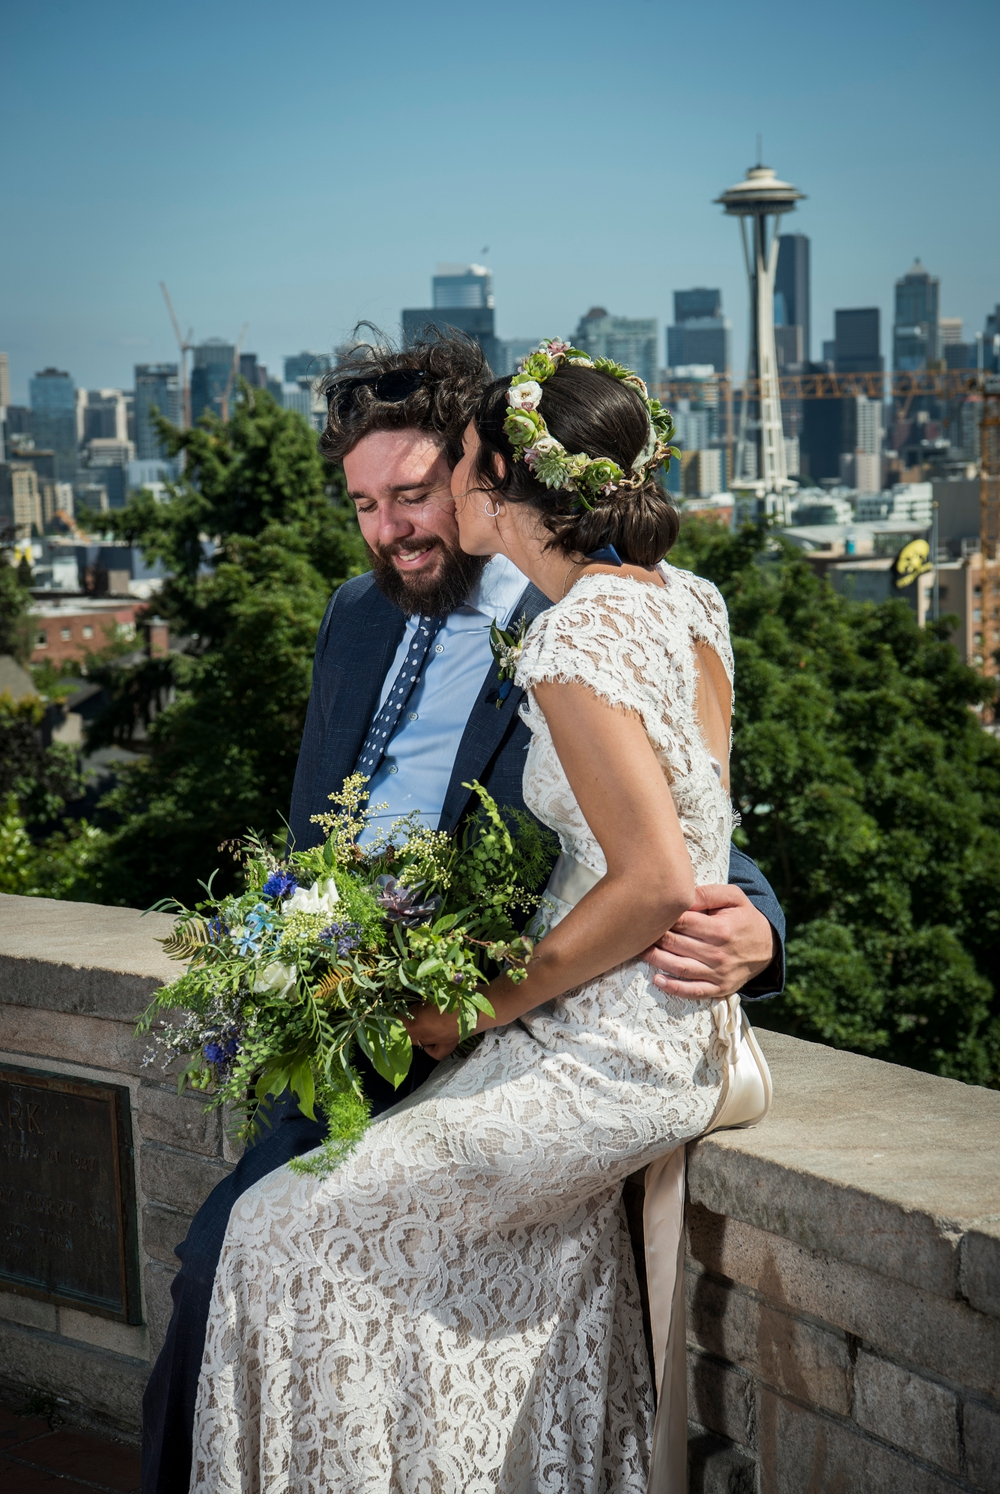 PNW-ferns-at-fremont-foundry-wedding-florist 12.jpg